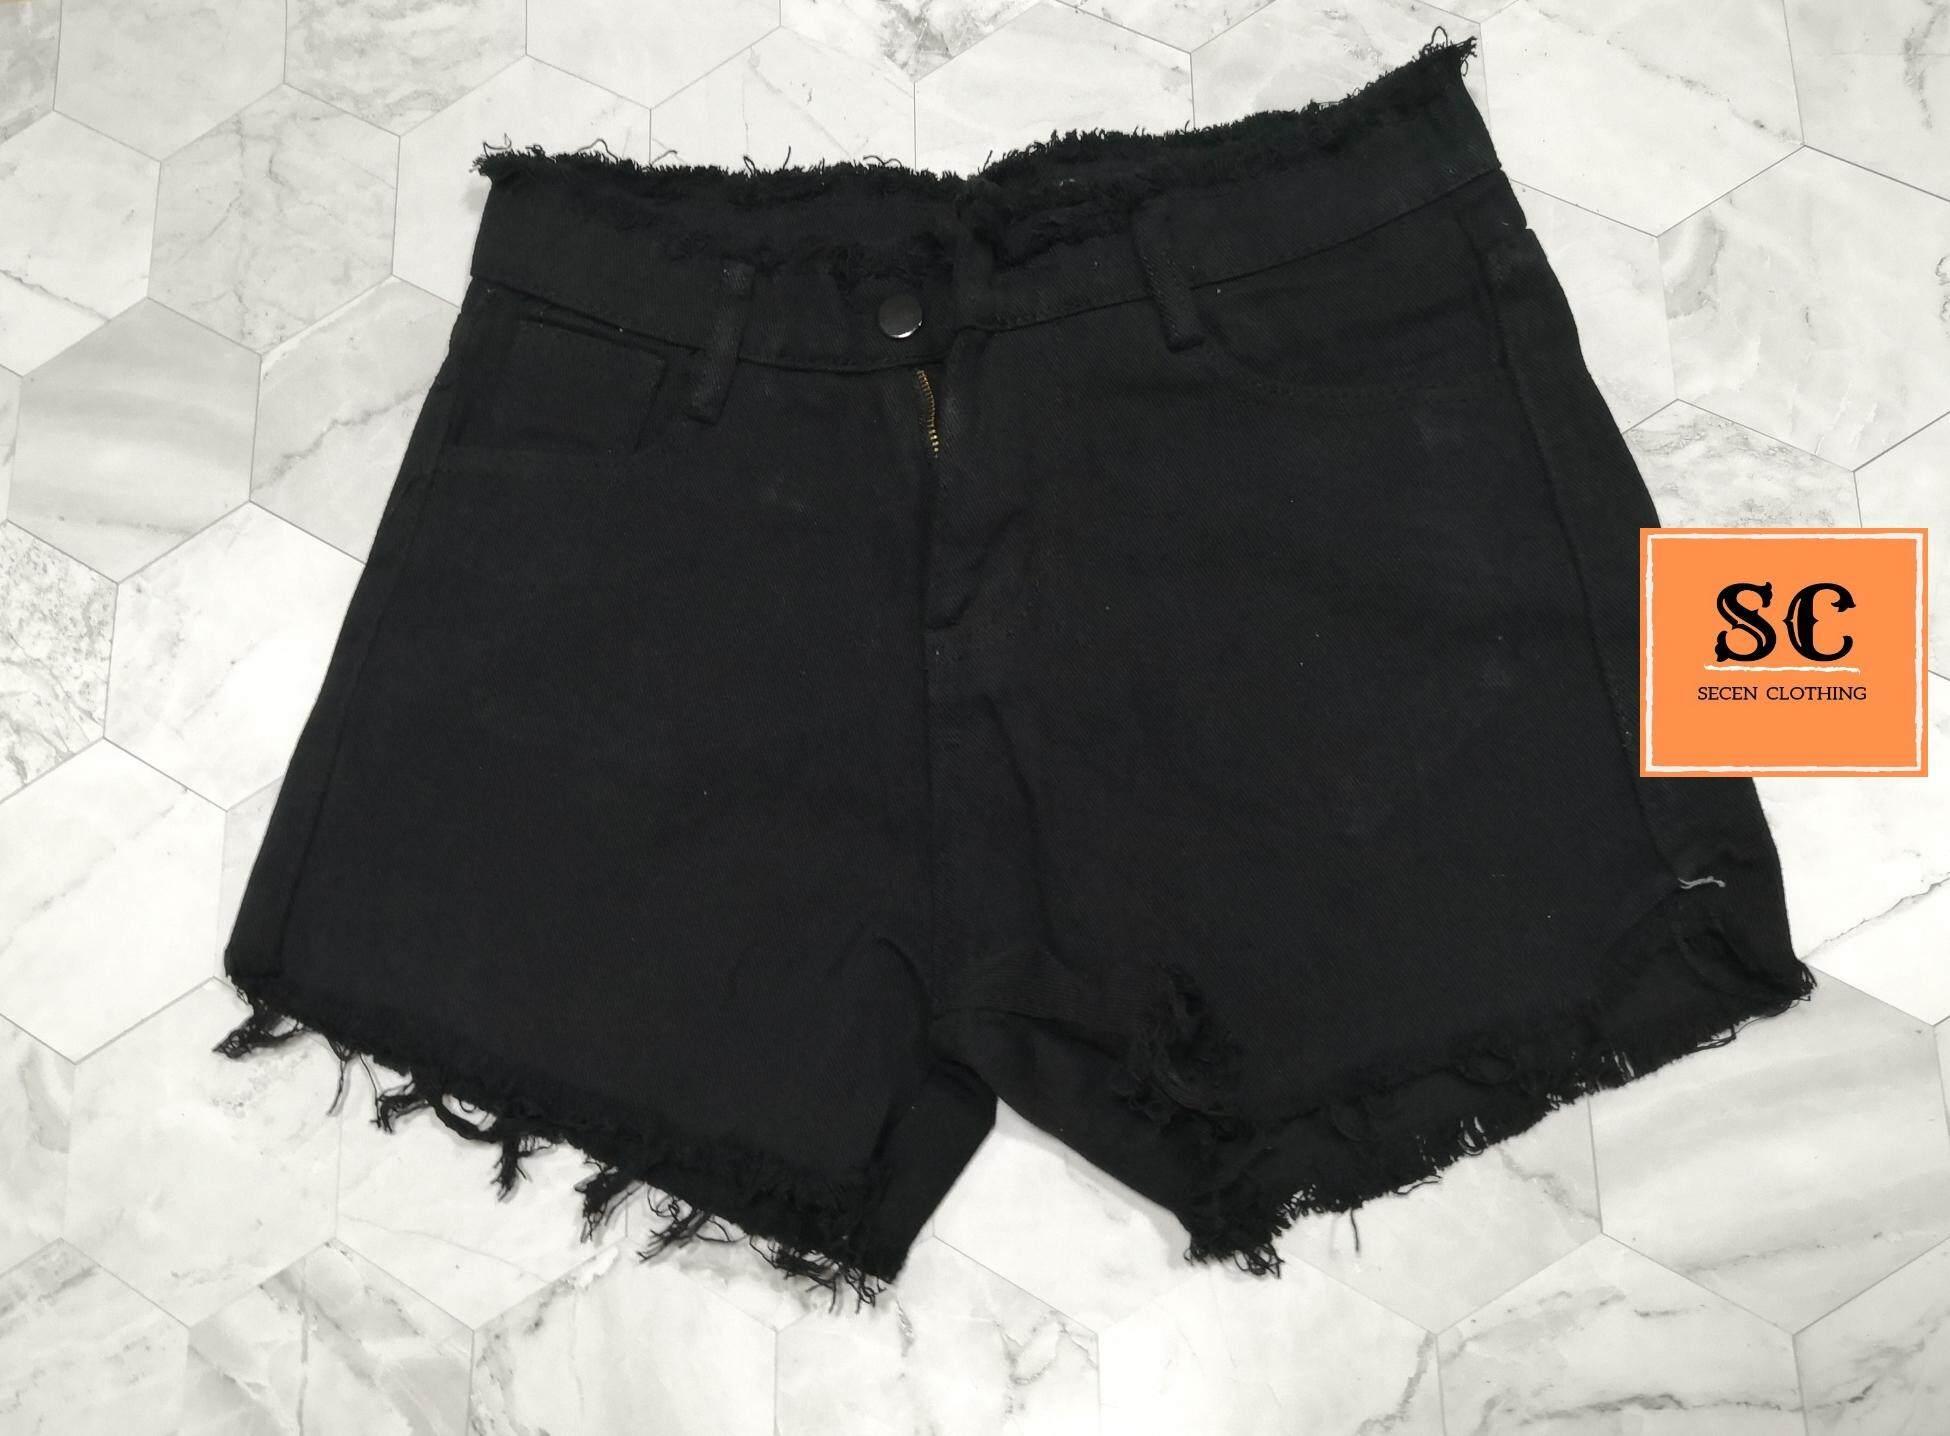 SECEN CLOTHS - กางเกงยีนส์ขาสั้น แฟชั่น มีเก็บเงินปลายทาง ส่งด่วน kerry   --พร้อมส่ง-- (รุ่น J-001)